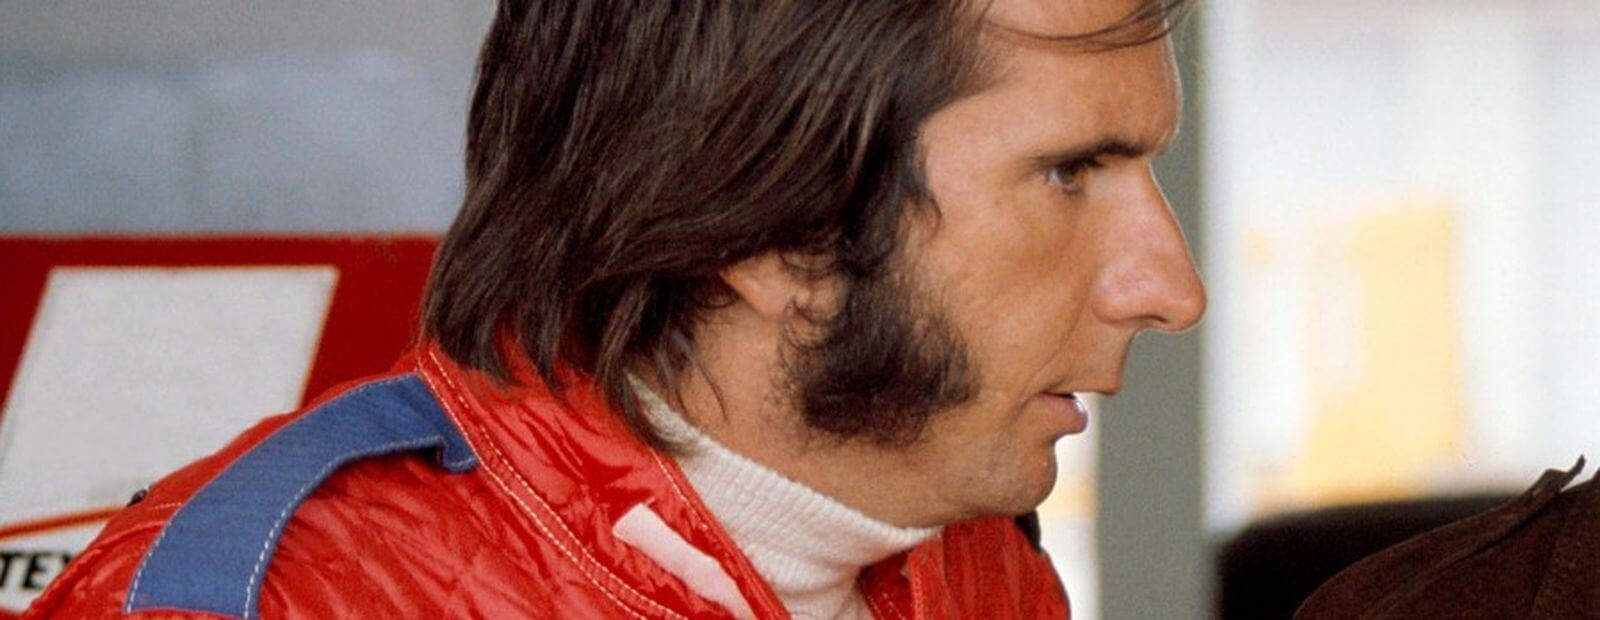 Emerson Fittipaldi melhor piloto de Fórmula 1